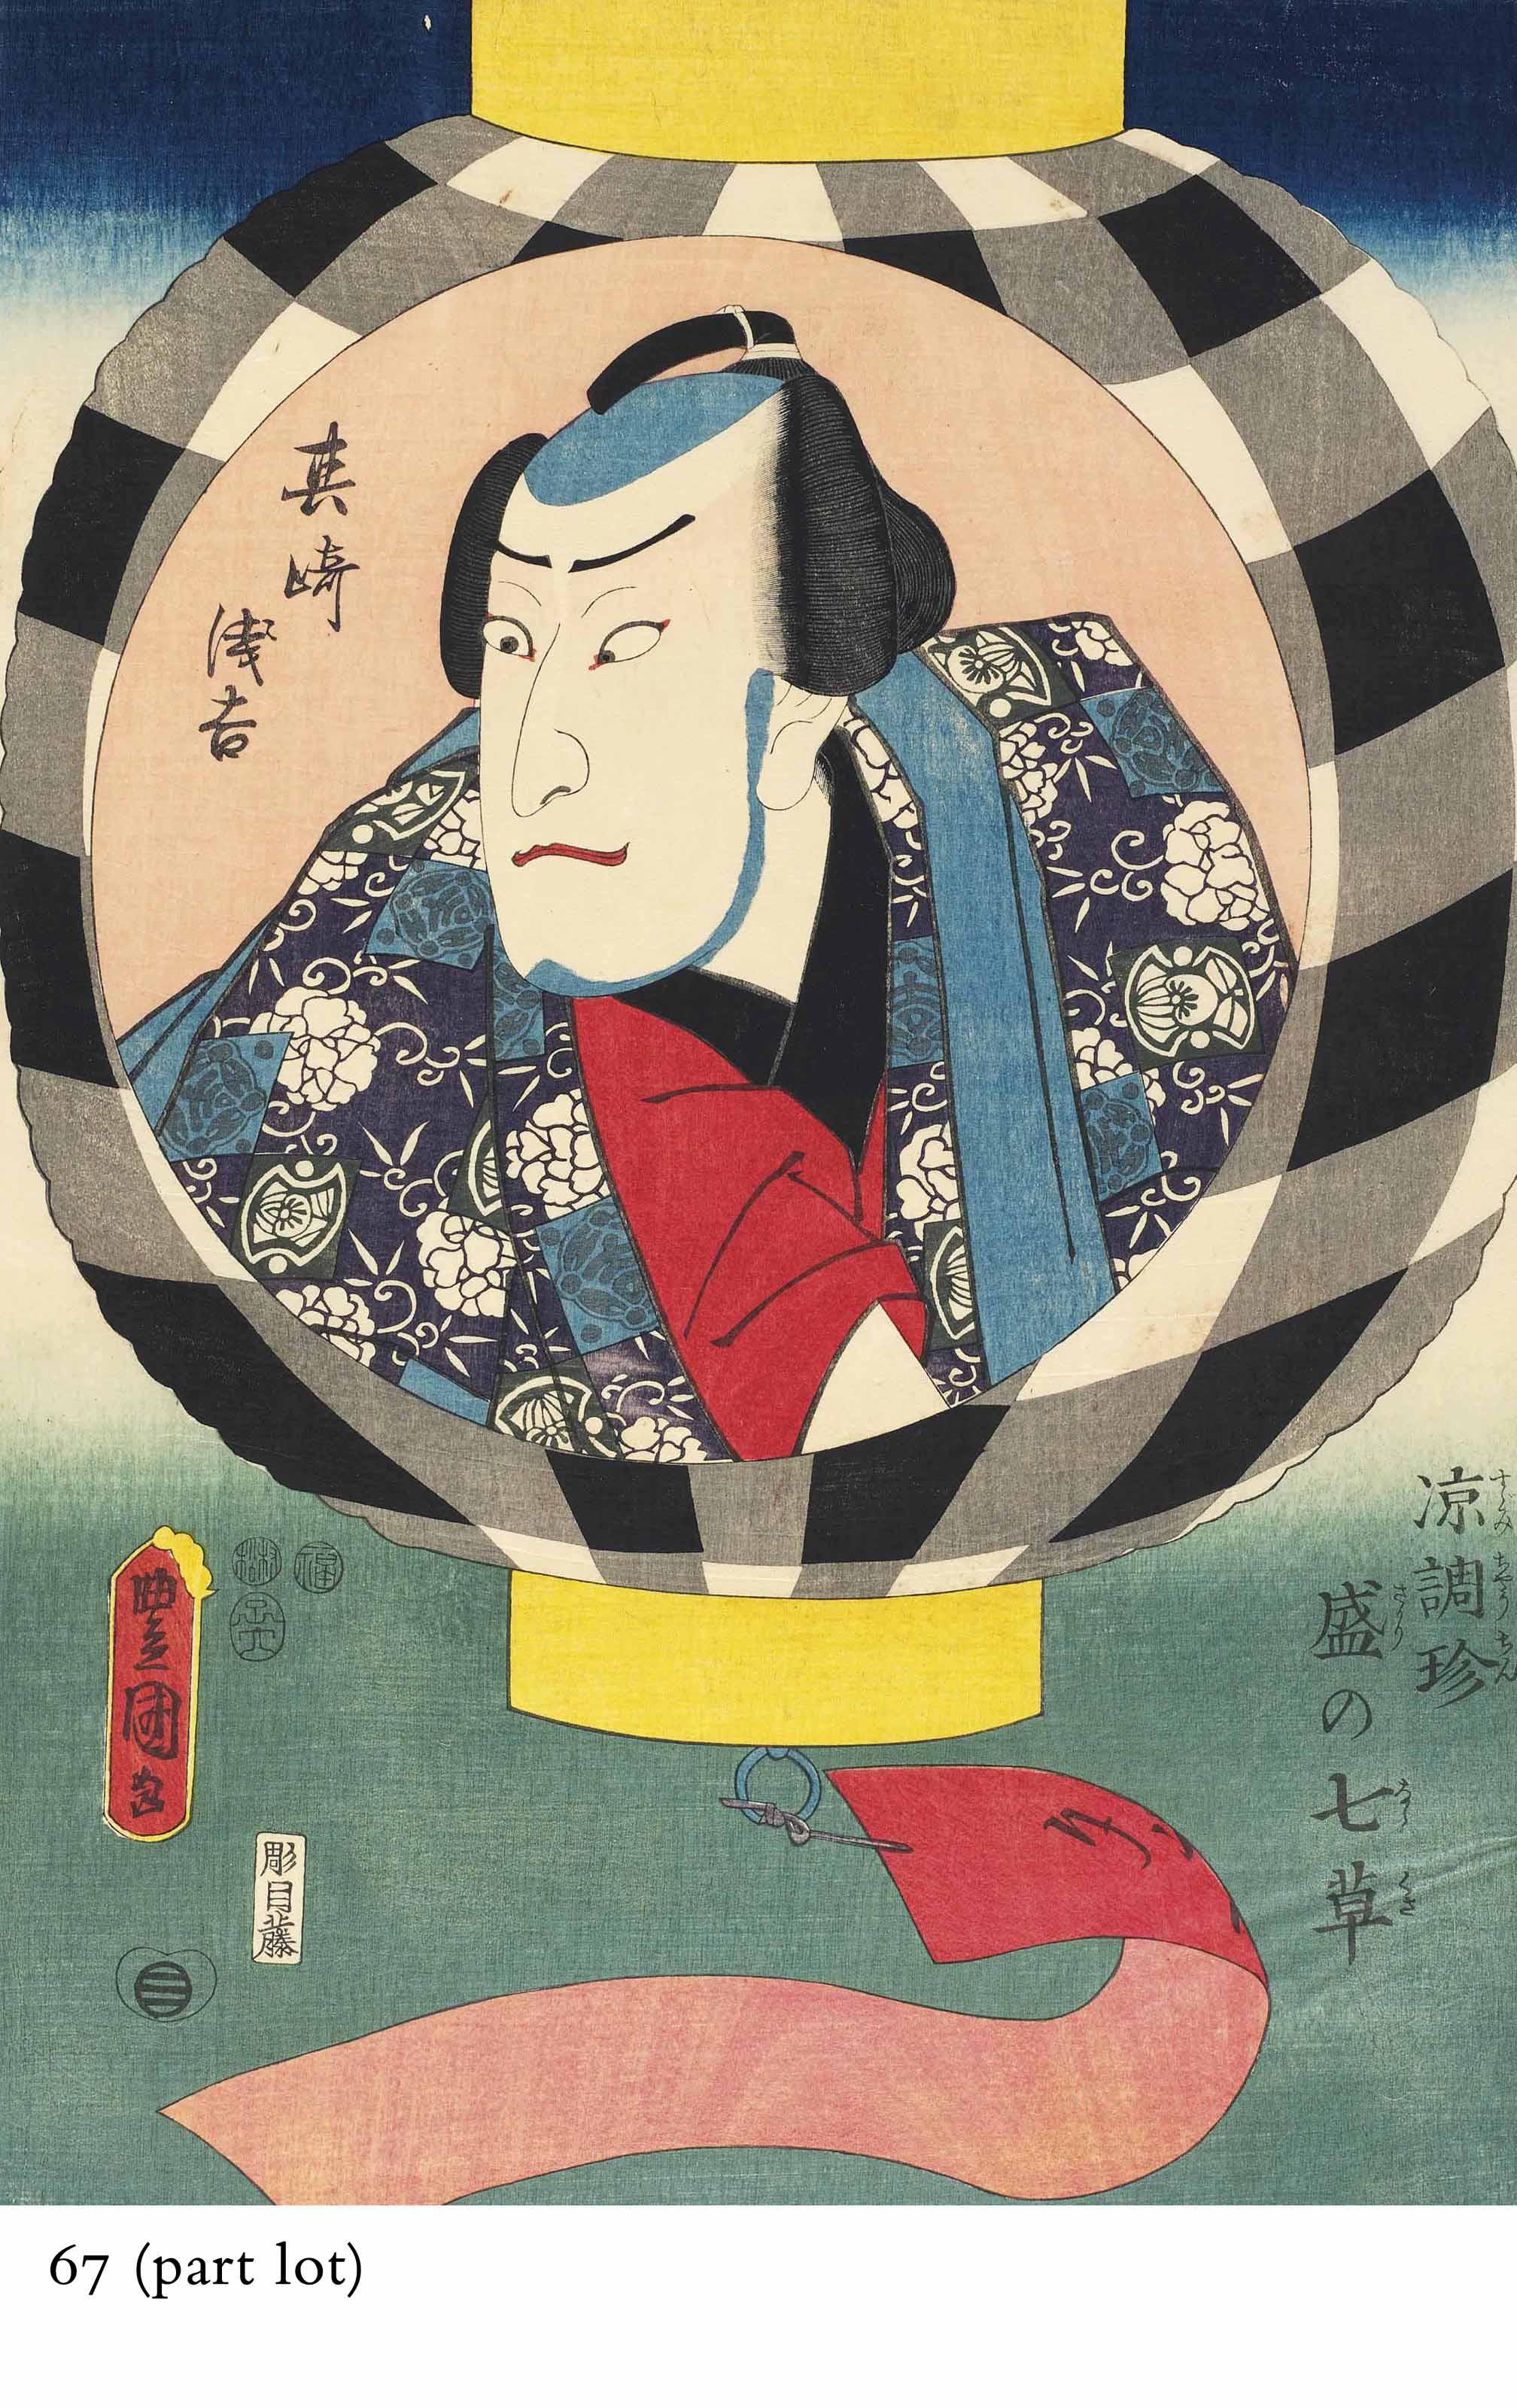 UTAGAWA KUNISADA (1786-1865) AND OTHERS